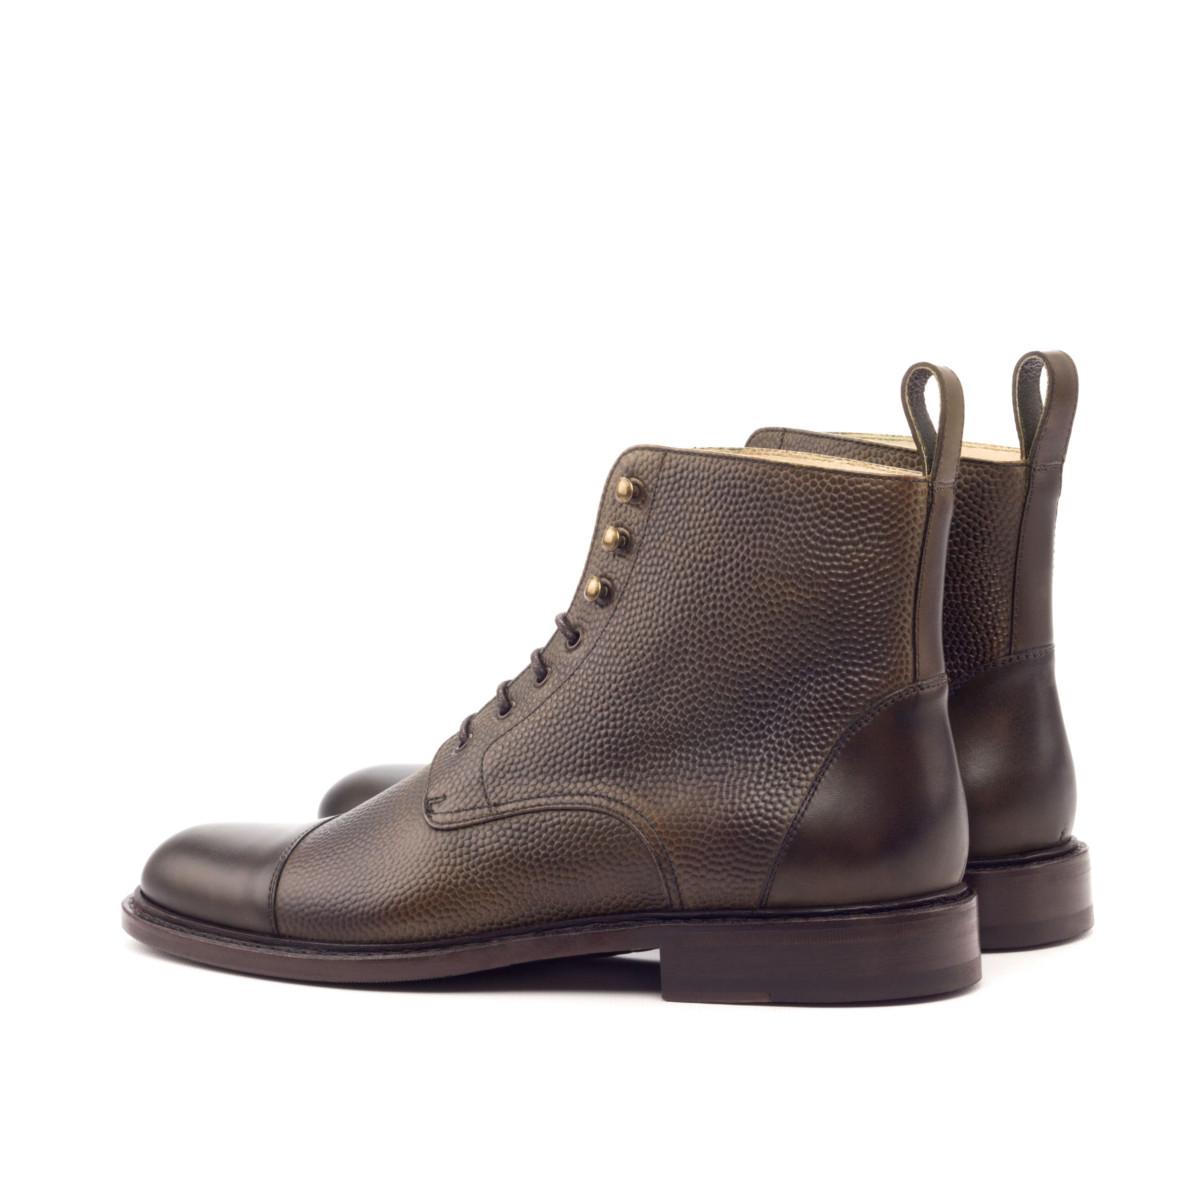 Pebble grain women's Cap Toe Boots